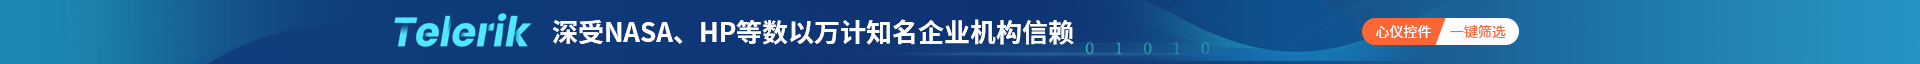 Kendo UI/Telerik全栈开发组件推荐,轻松构建交互式现代UI应用